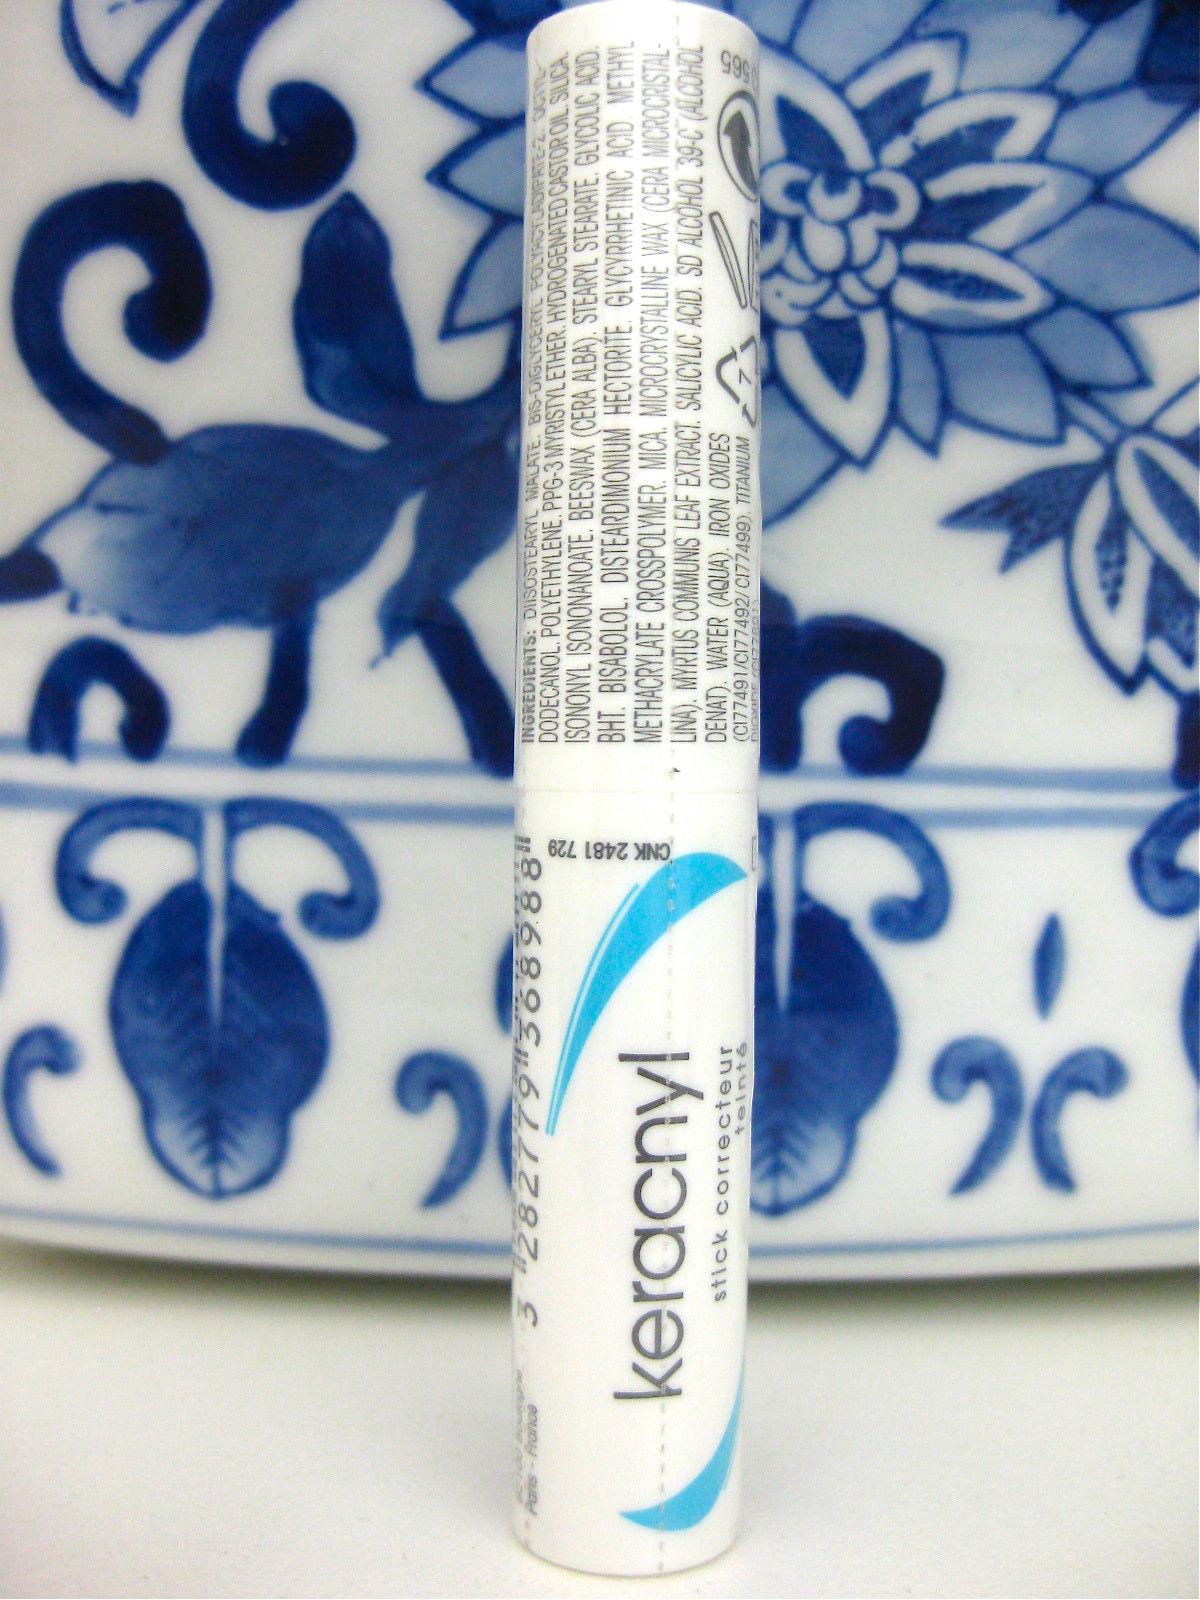 DUCRAY Keracnyl Stick Corrector Spot Treatment Concealer